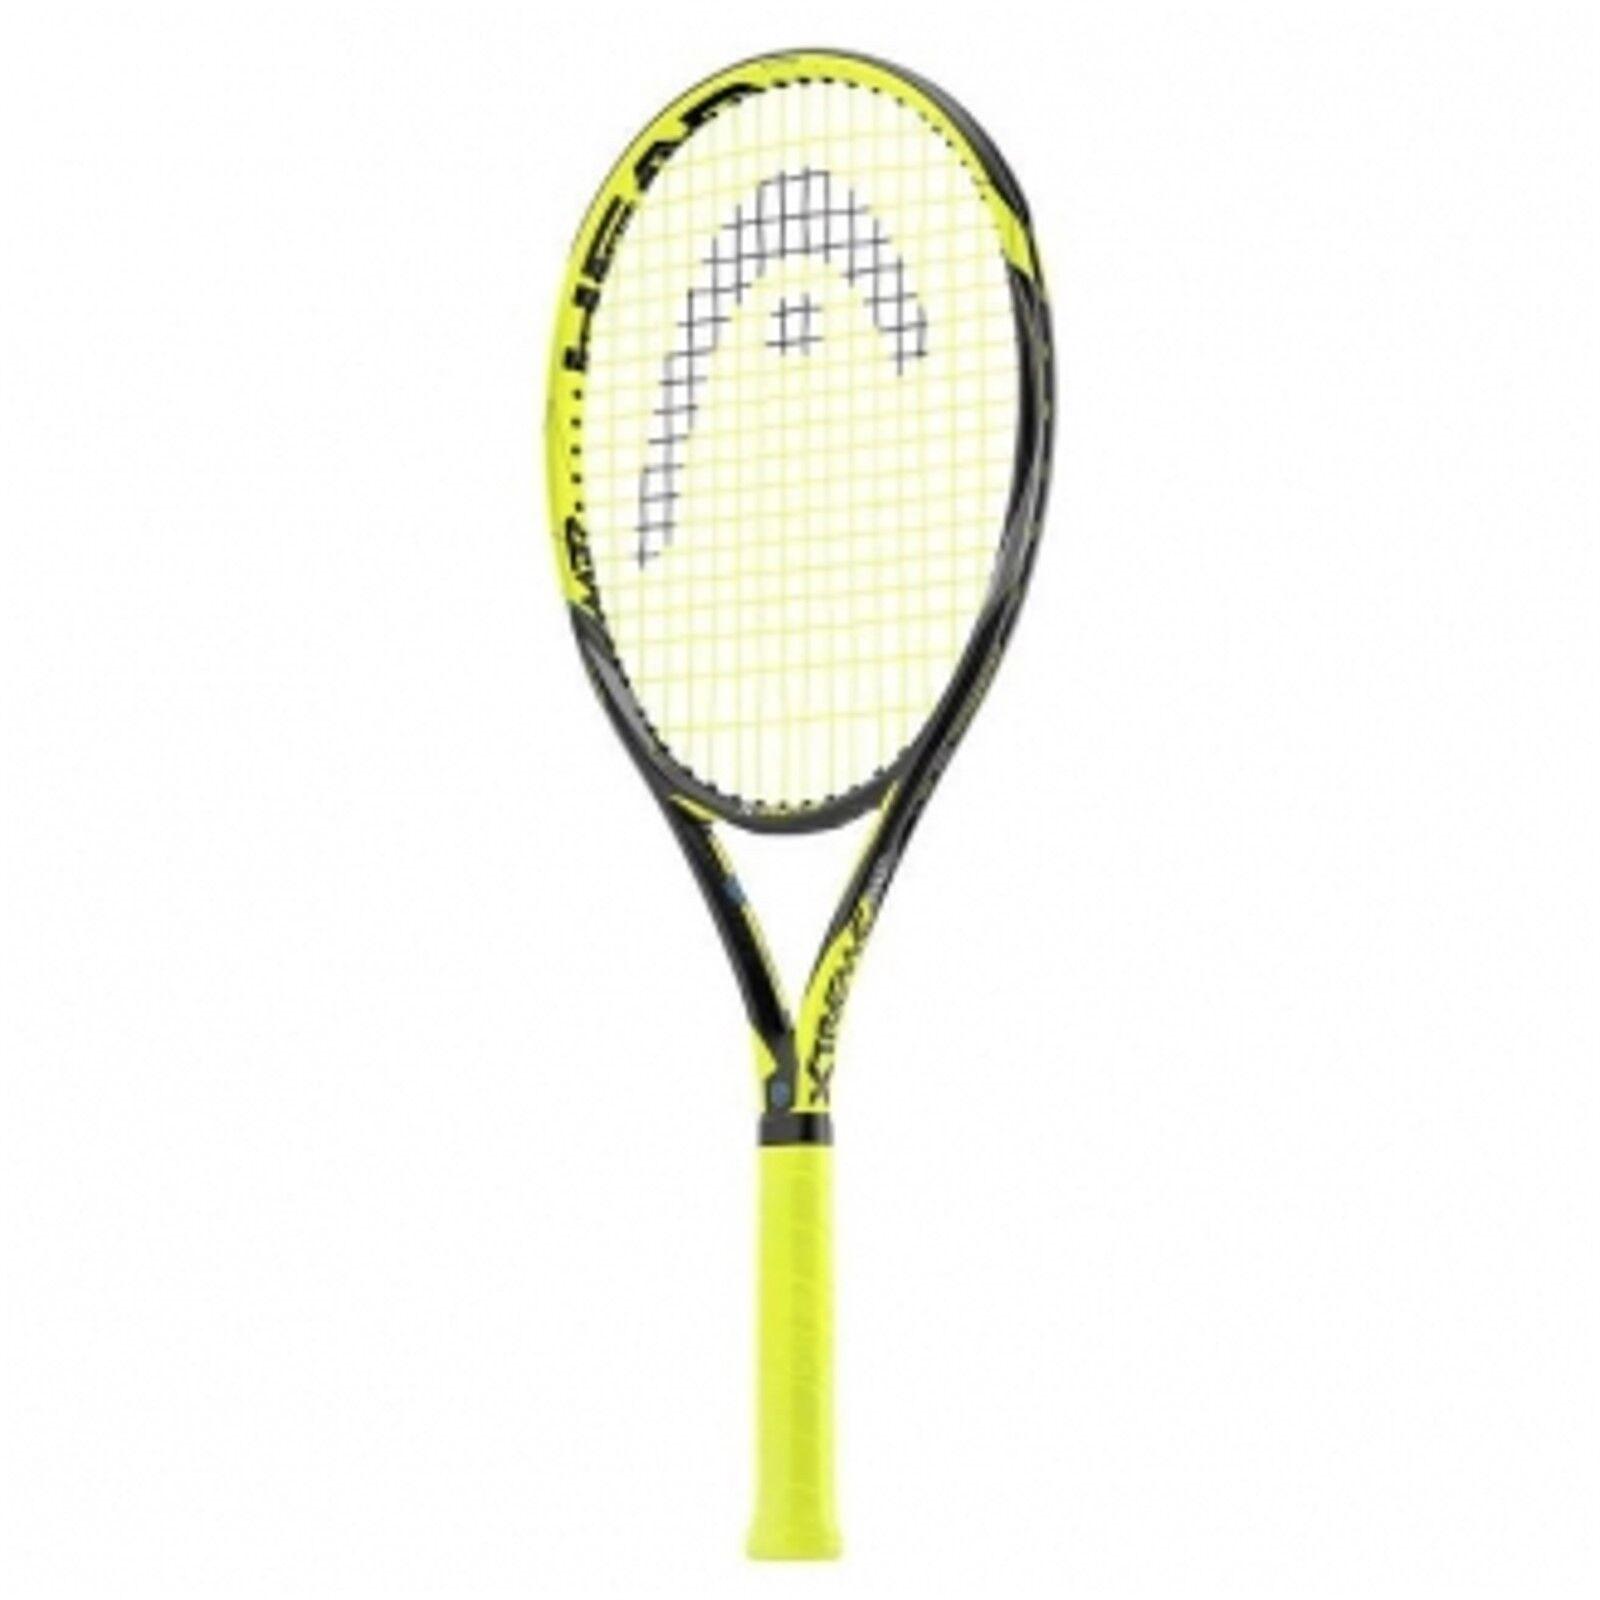 Head G G G Touch Extreme MP Tennisschläger dcd5c6